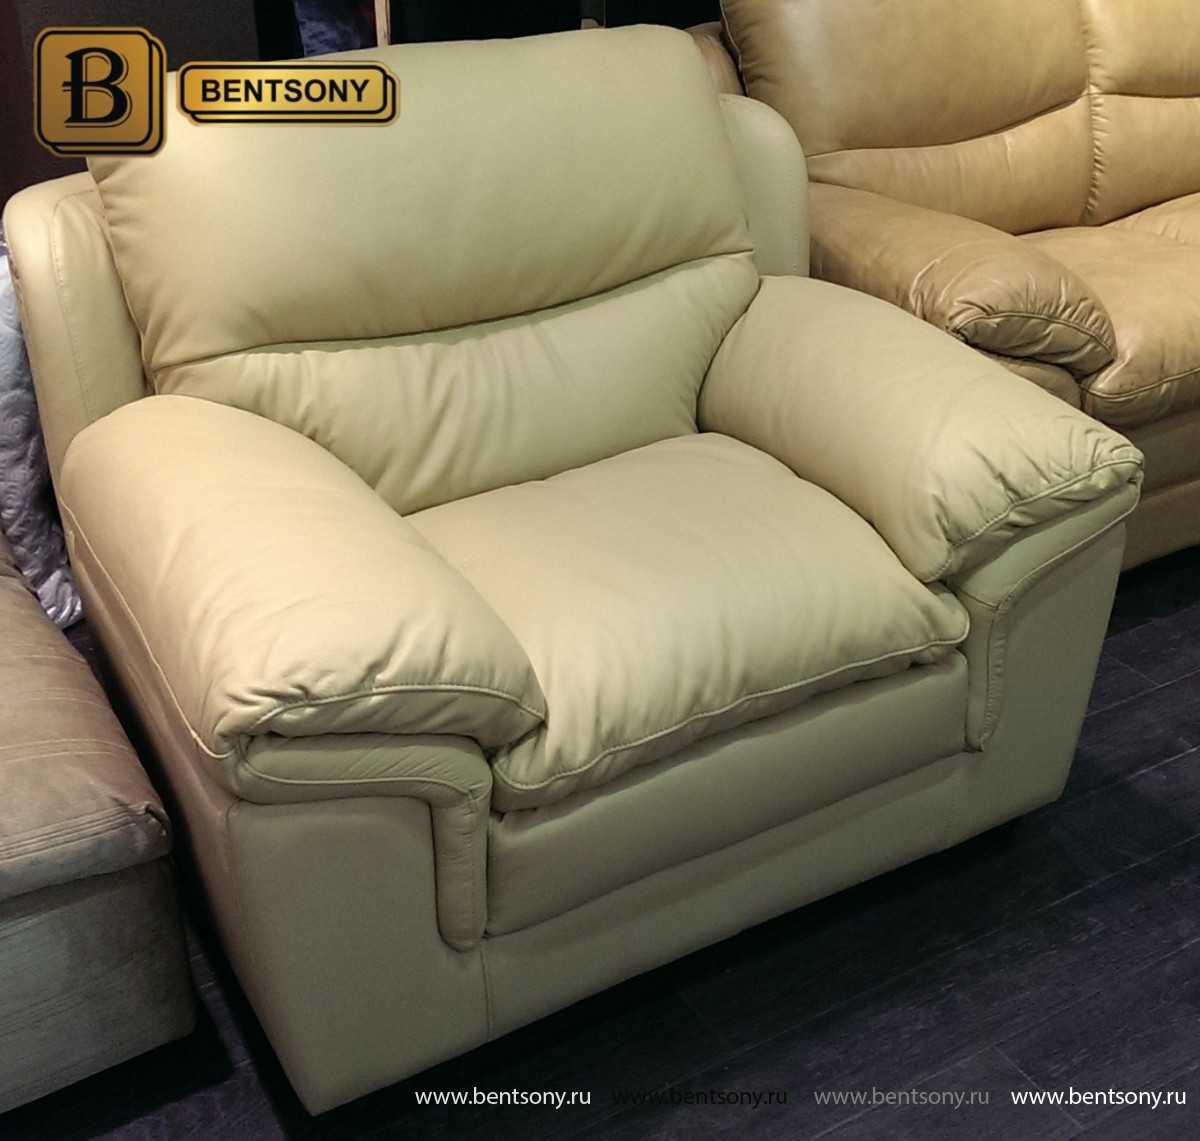 Кресло Маниани для квартиры